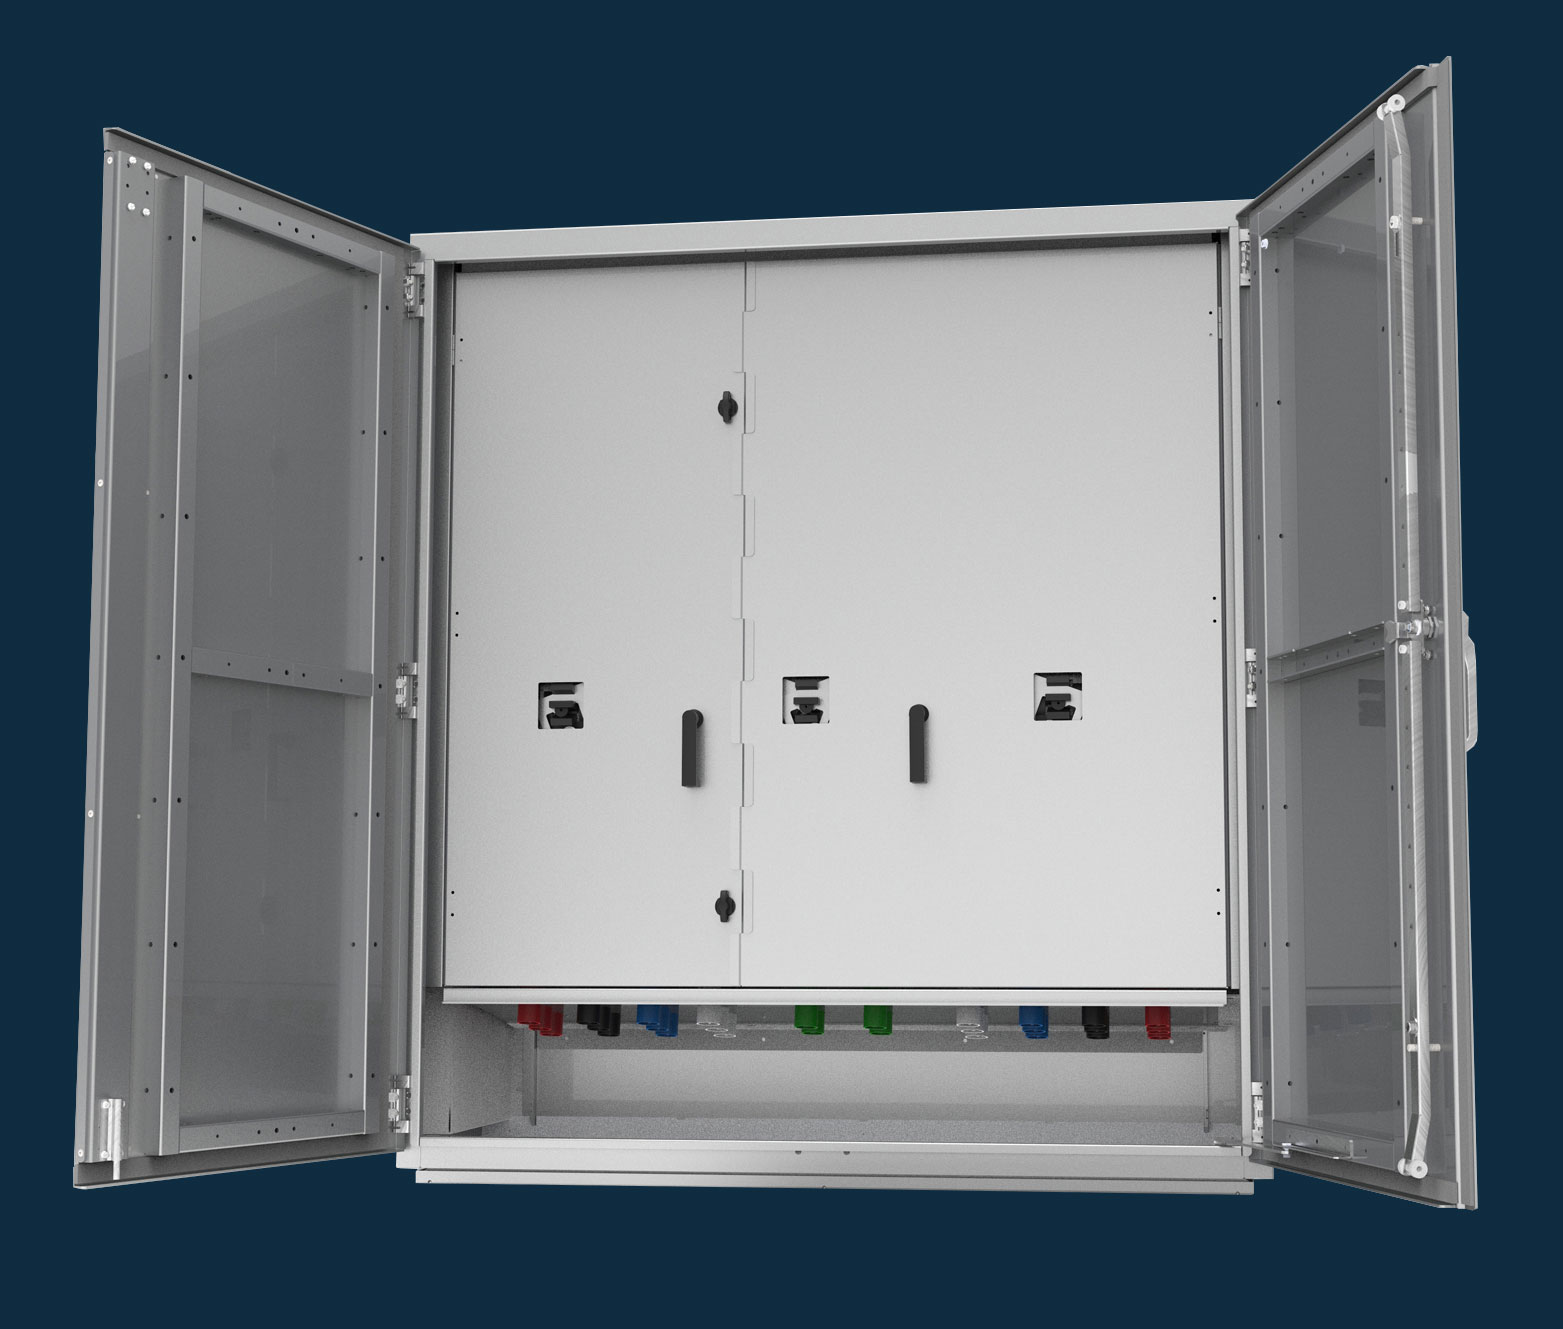 1 Provider Of Electrical Tap Box Amp Generator Docking